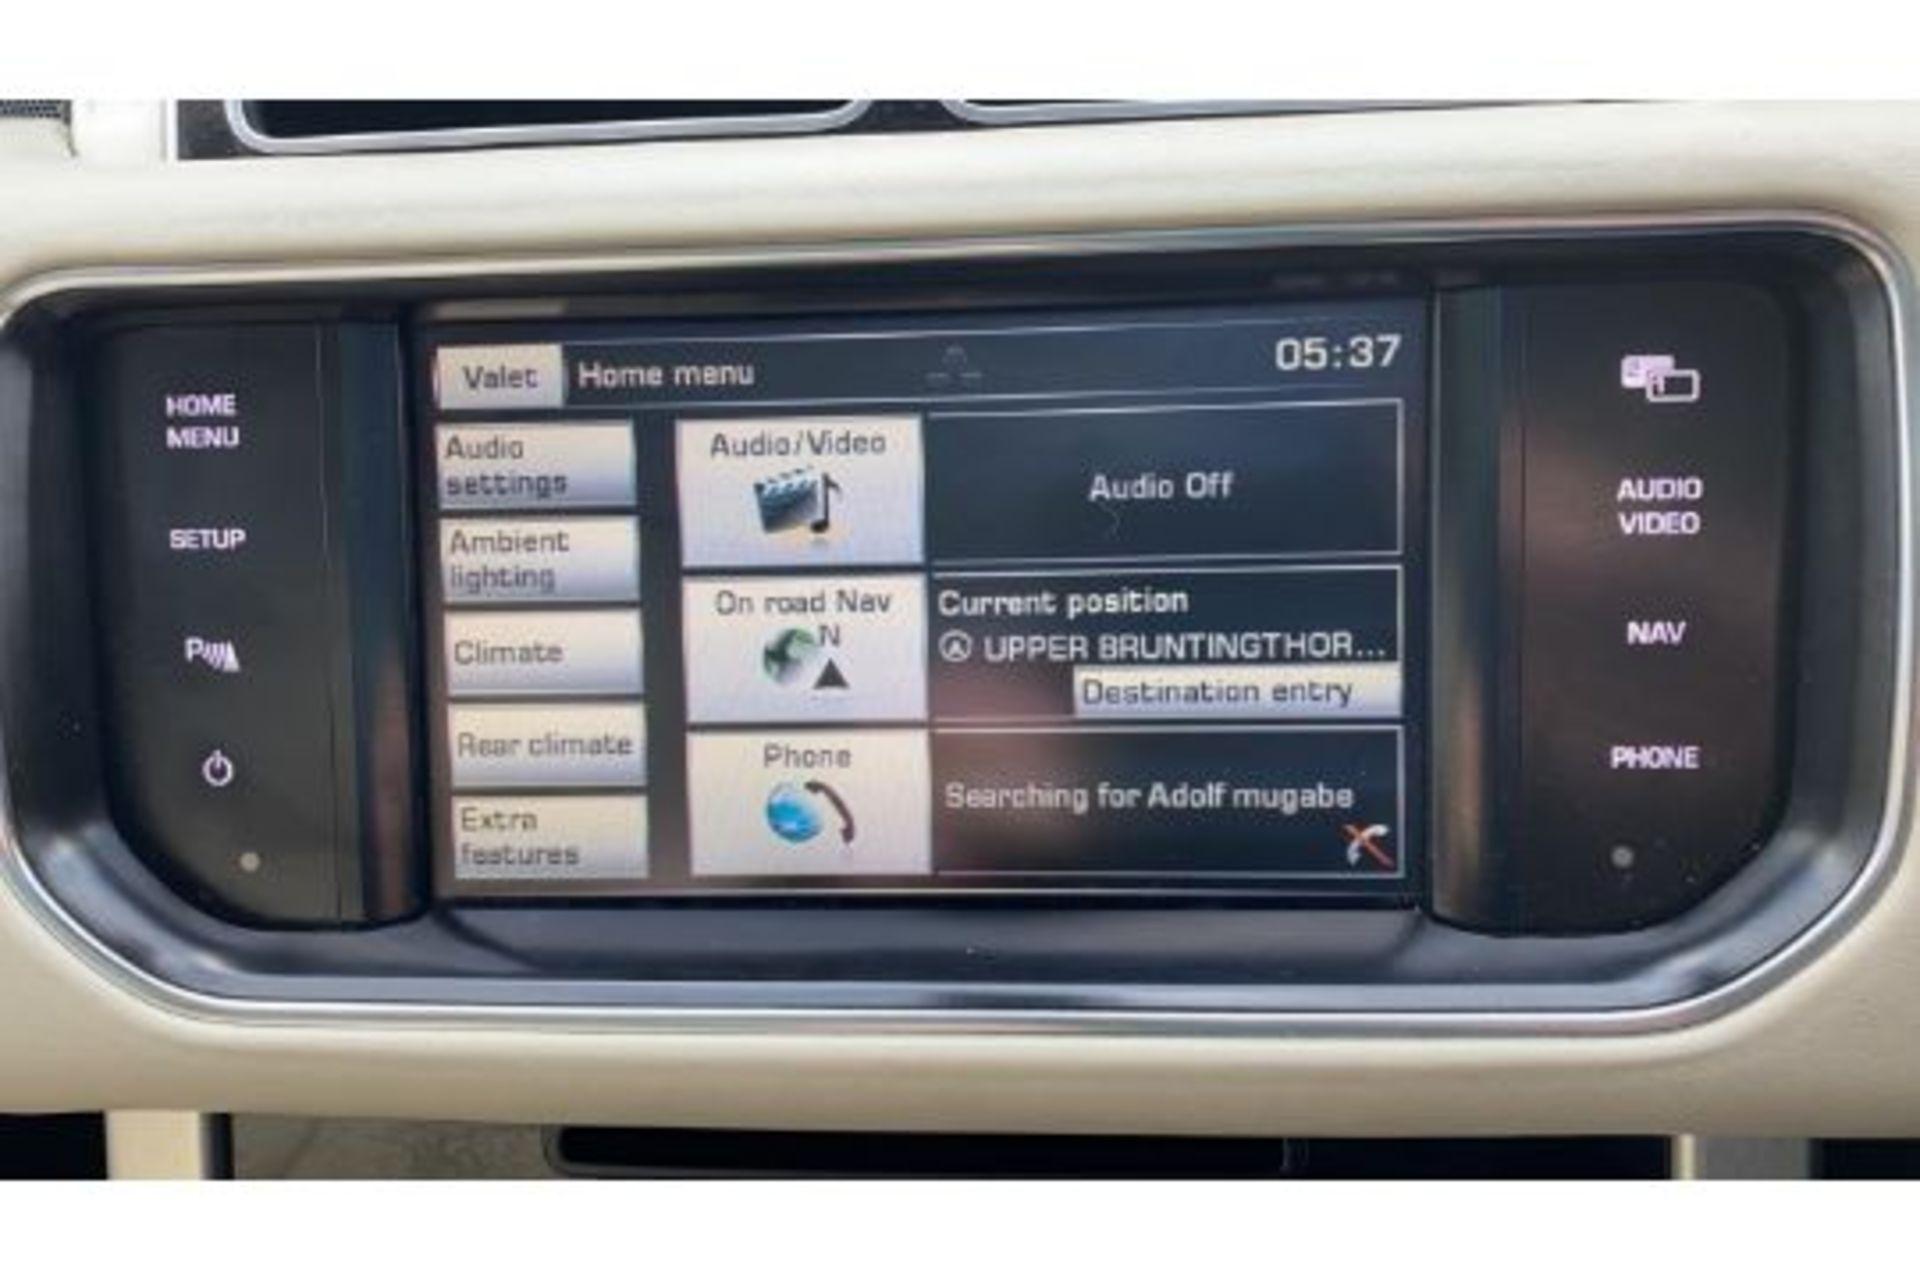 Range Rover Vogue 3.0 TDV6 SE Auto - Black Pack - NEW SHAPE - FULLY LOADED - Pan Roof - Image 22 of 30